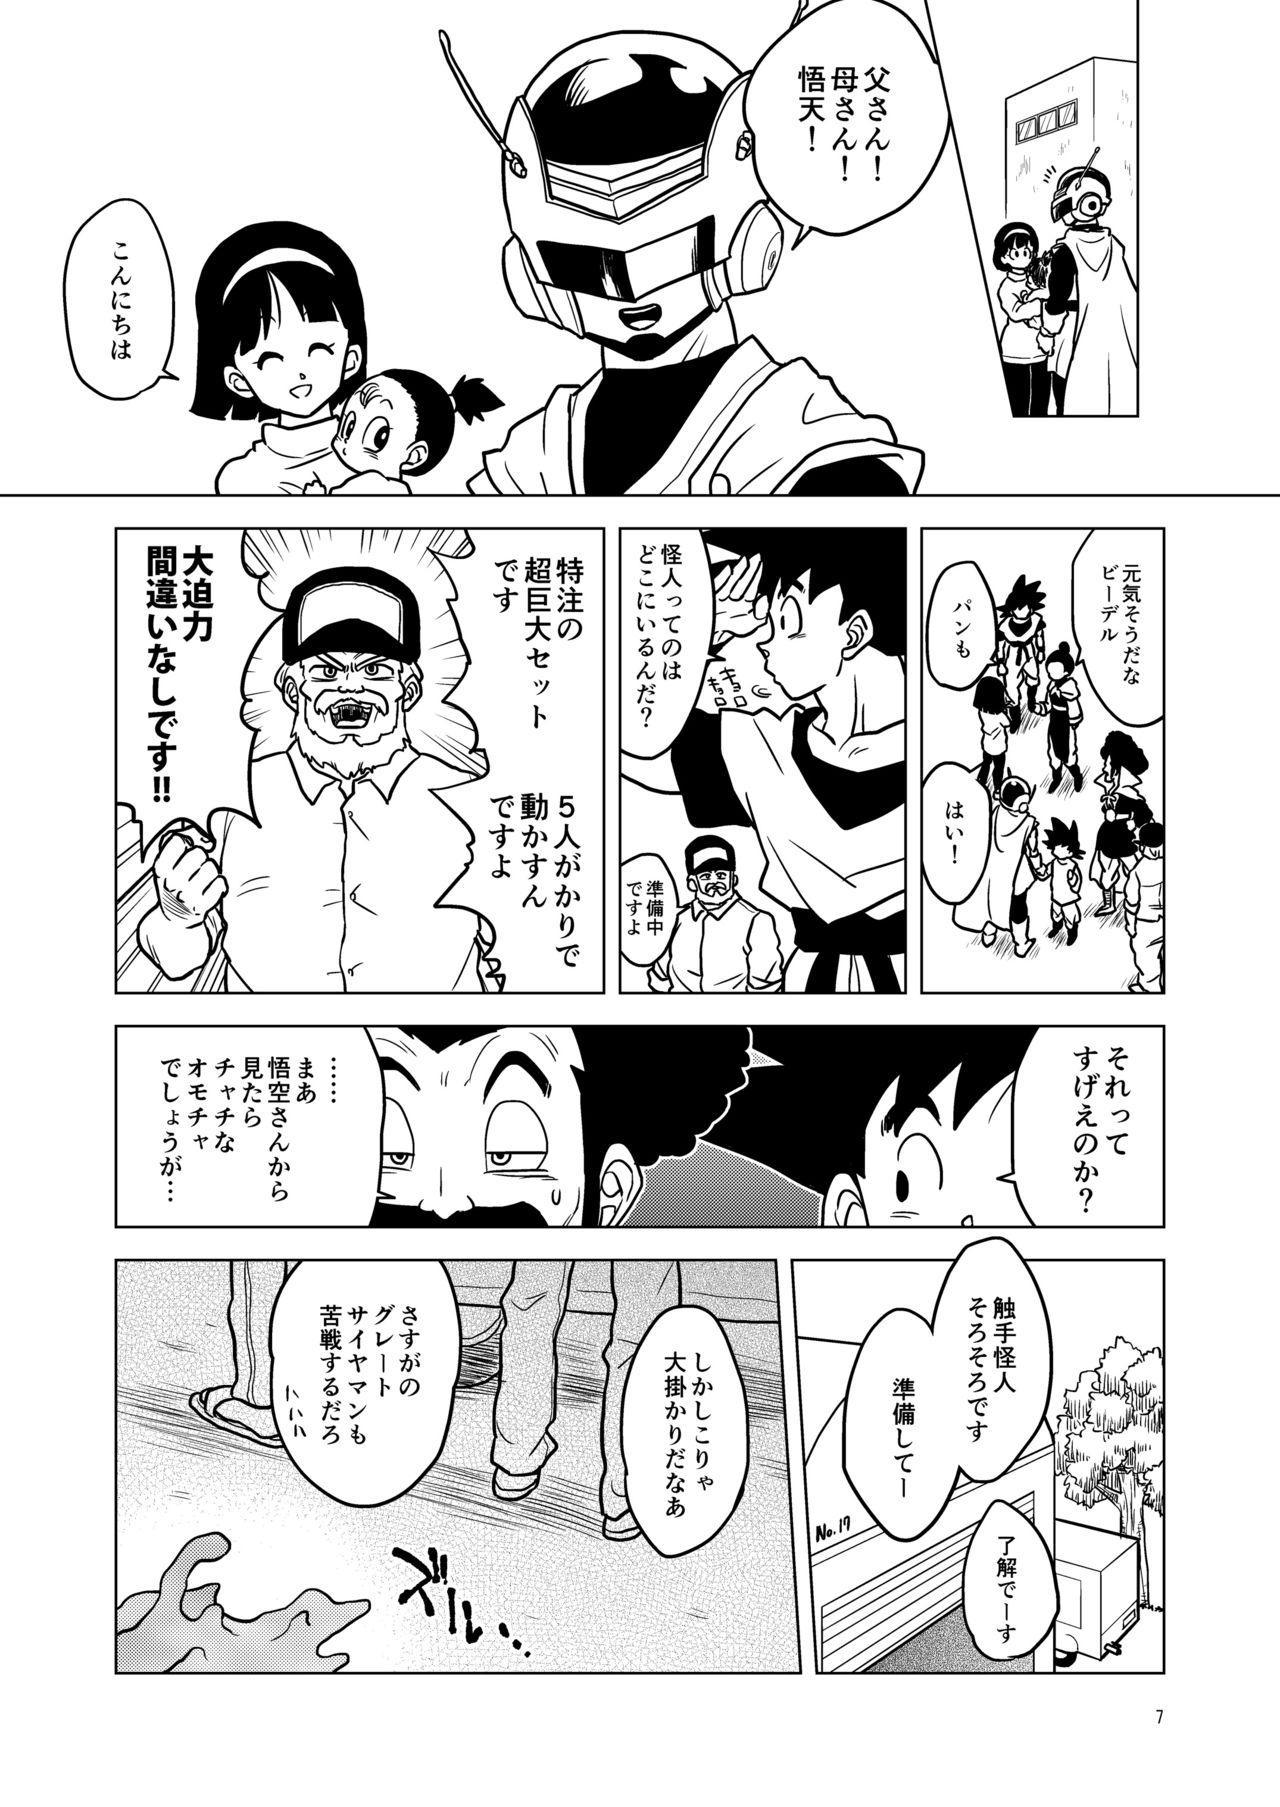 Great Saiyaman vs Shokushu Kaijin 6